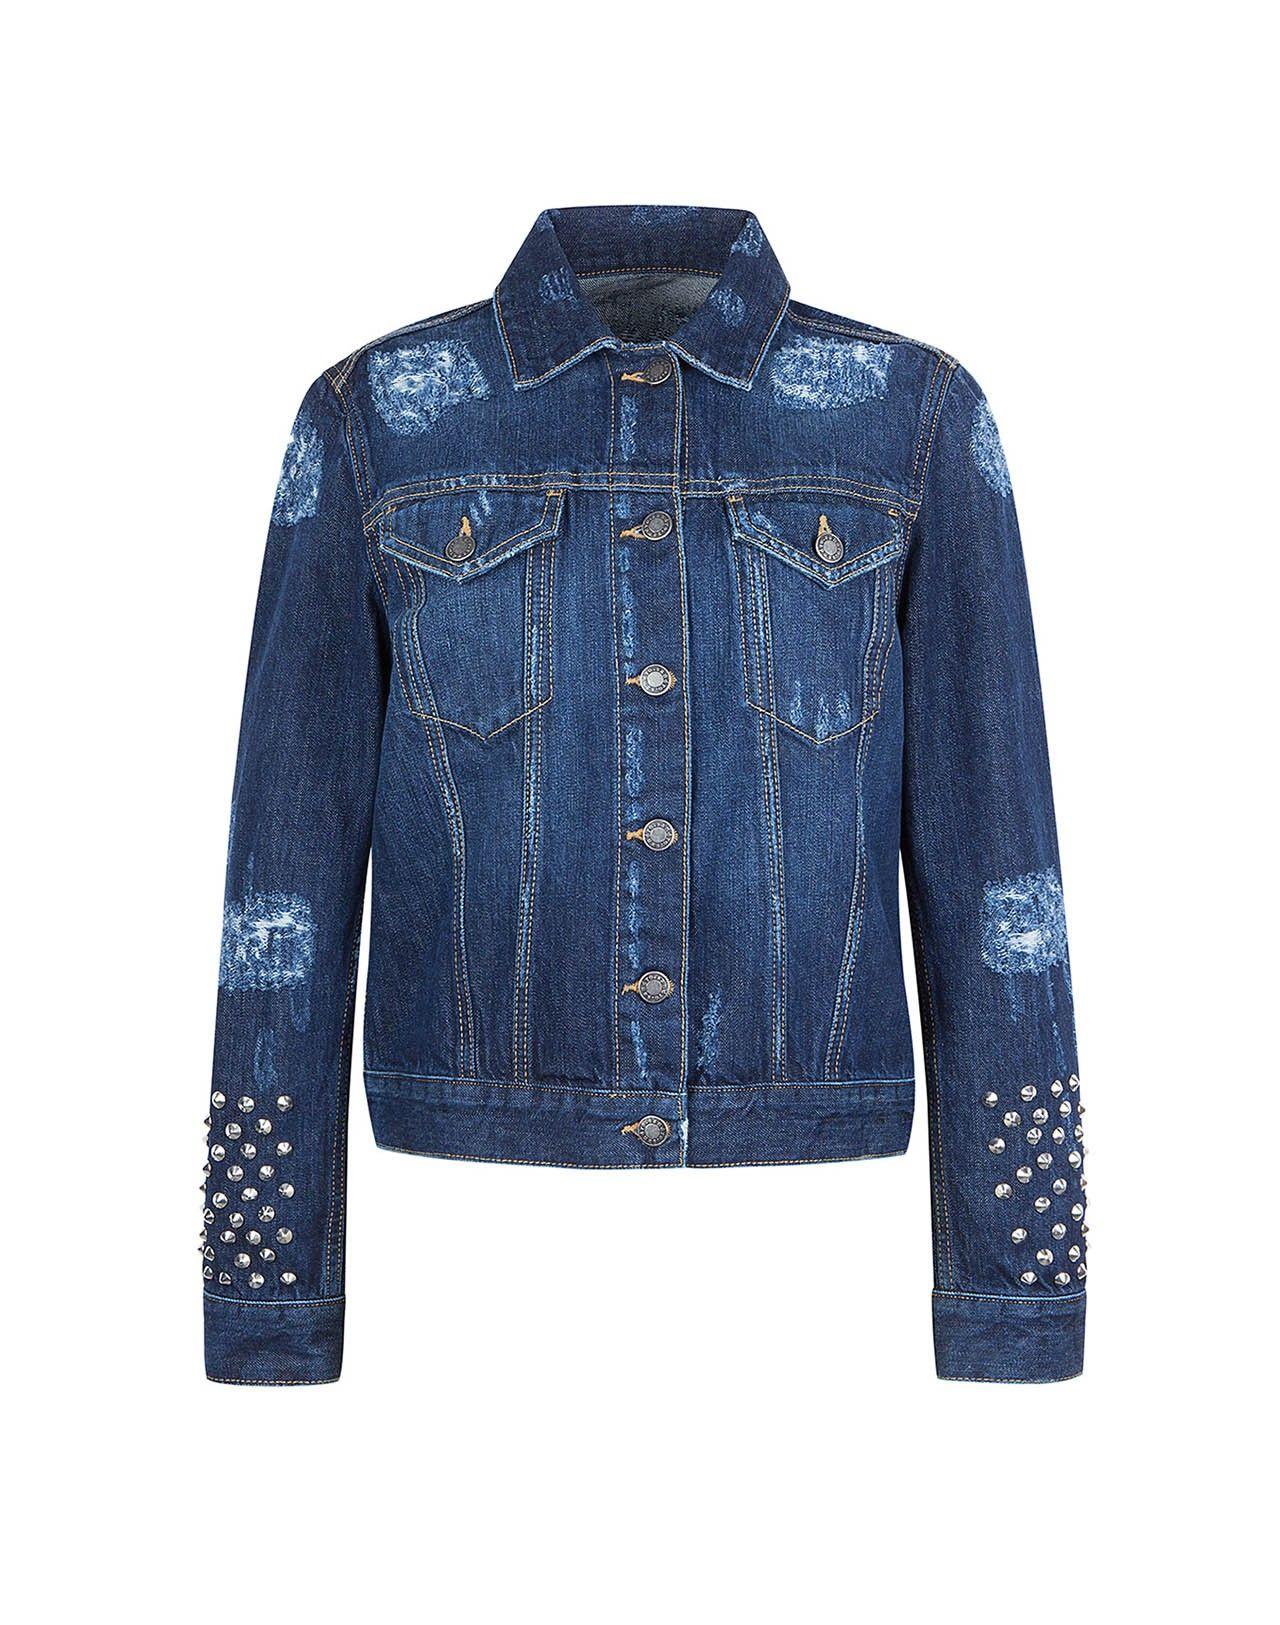 Vintage Sale Women Sandro Fashion Vintage Jean Jacket Distressed Denim Jacket [ 1625 x 1280 Pixel ]